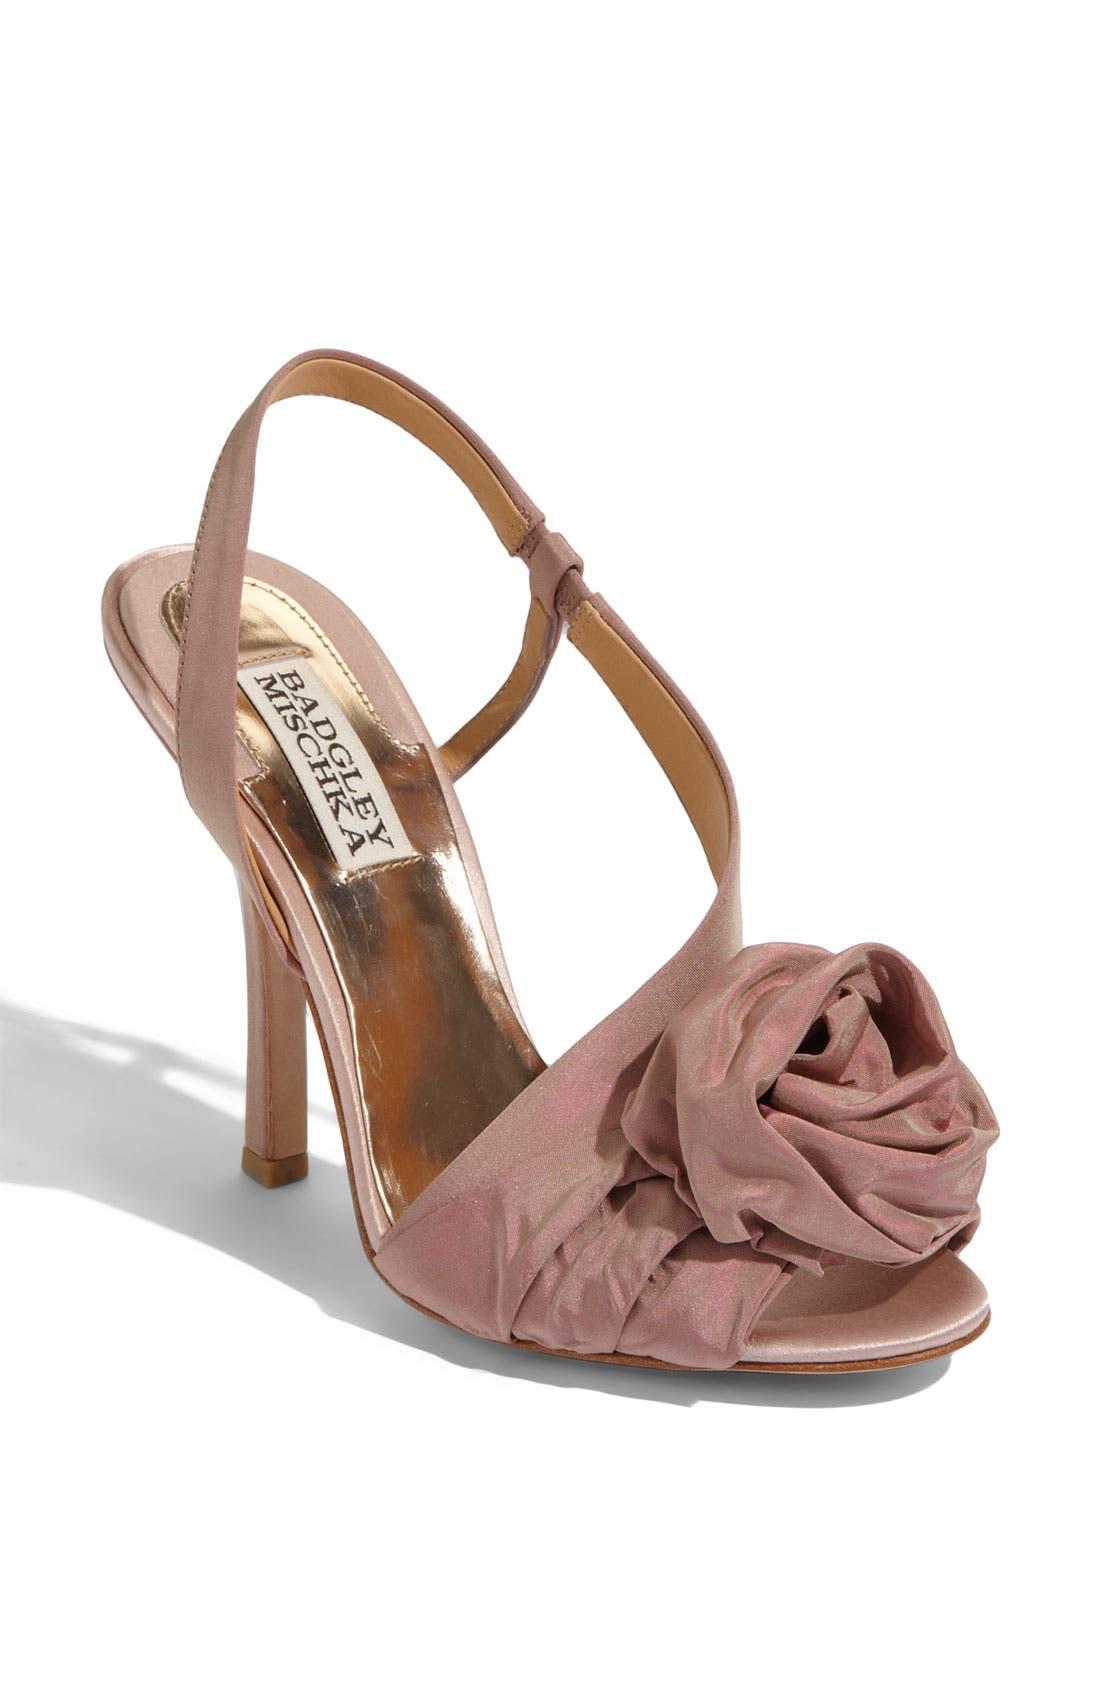 Main Image - Badgley Mischka 'Lanah' Sandal